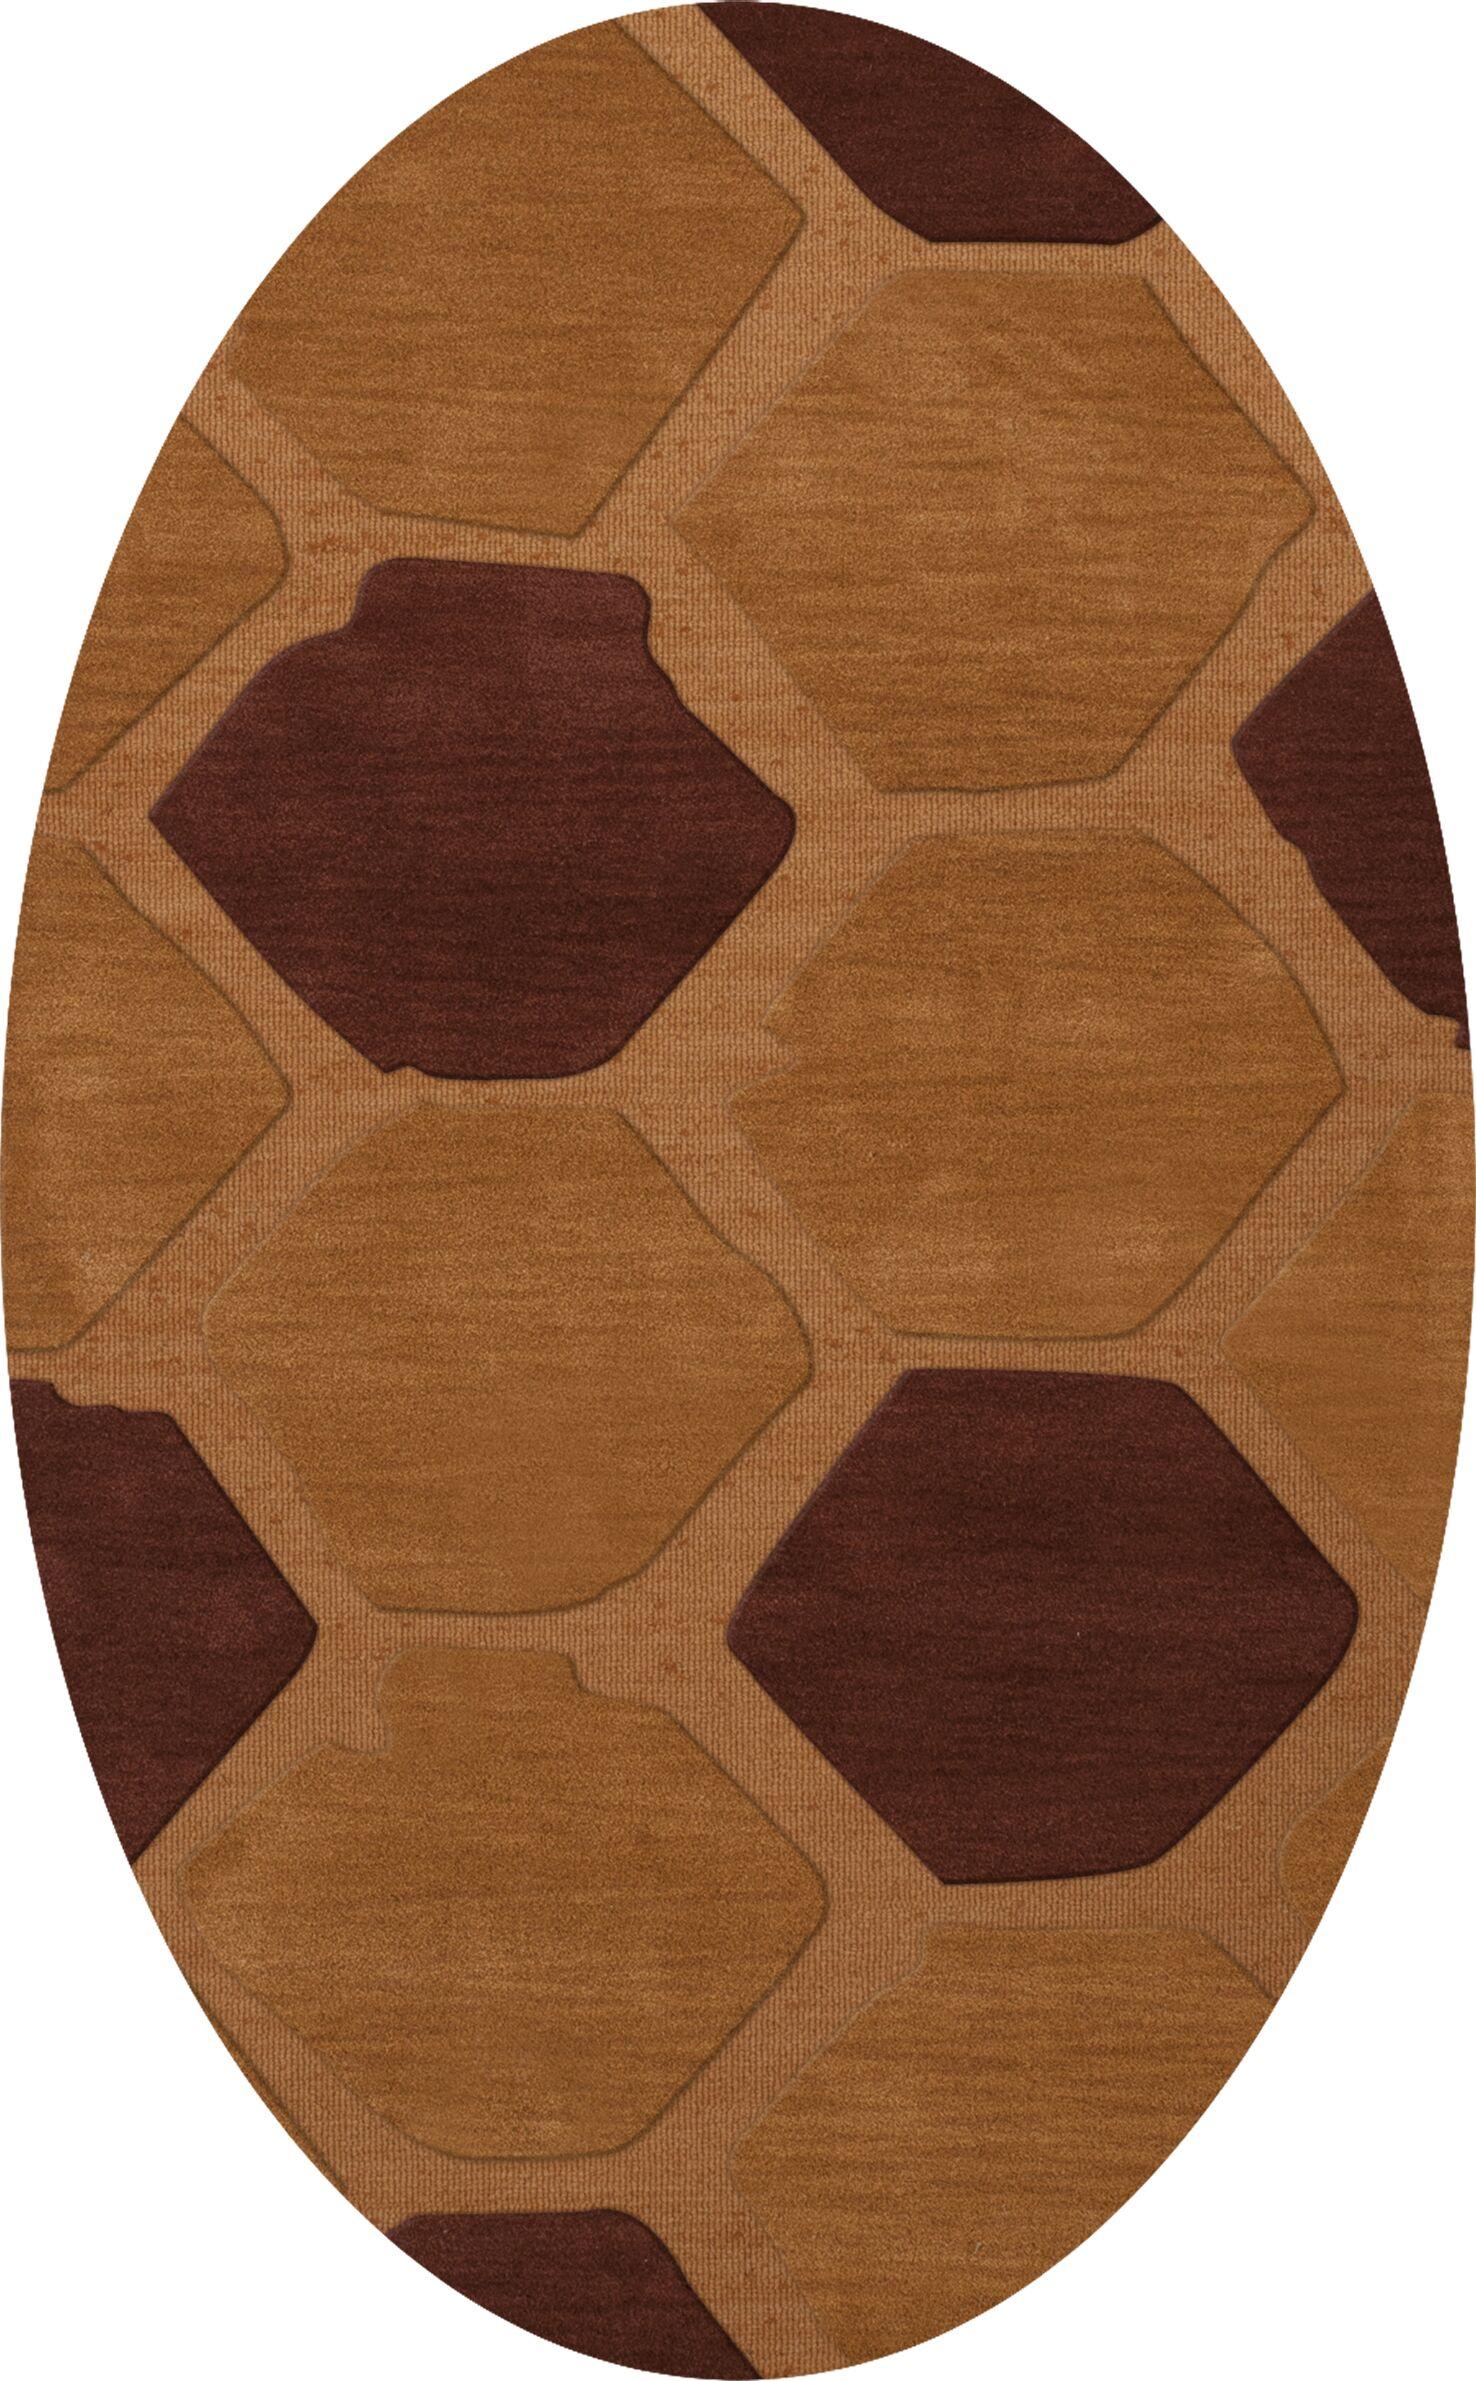 Hamswell Wool Cider Area Rug Rug Size: Oval 9' x 12'